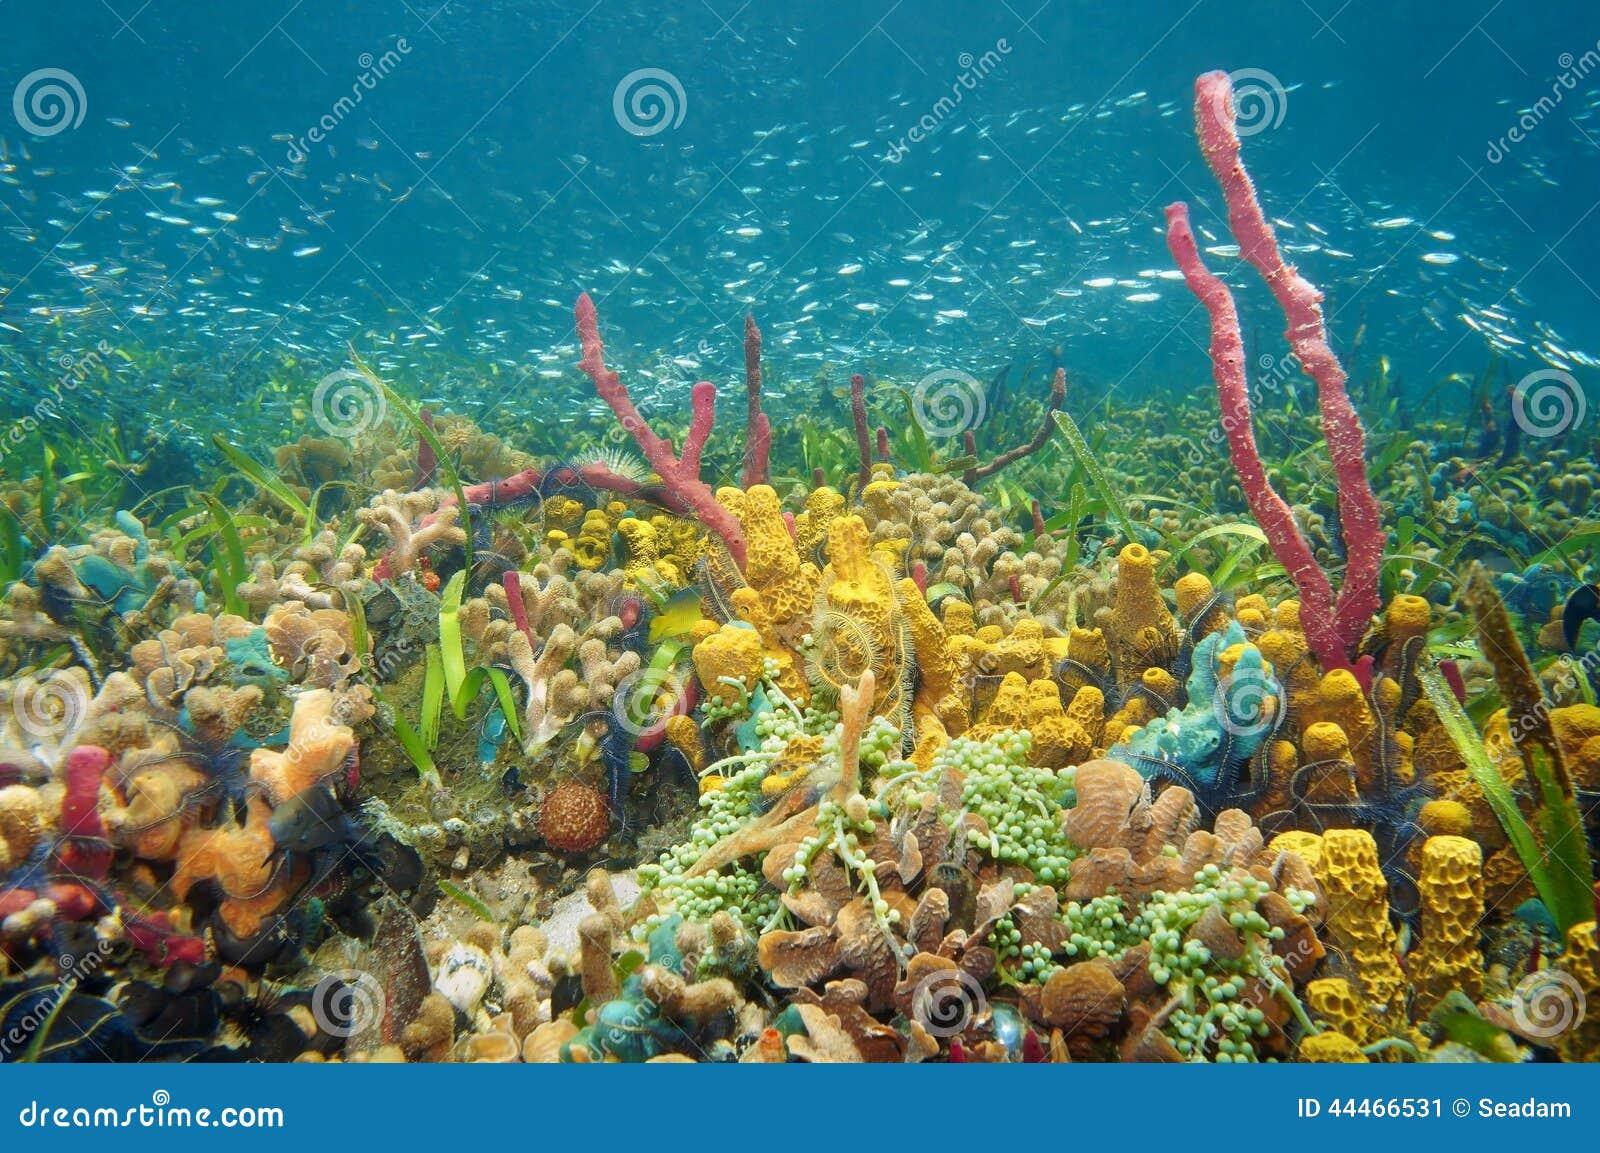 colorful sea life | Marine Life | Pinterest |Colorful Underwater Life